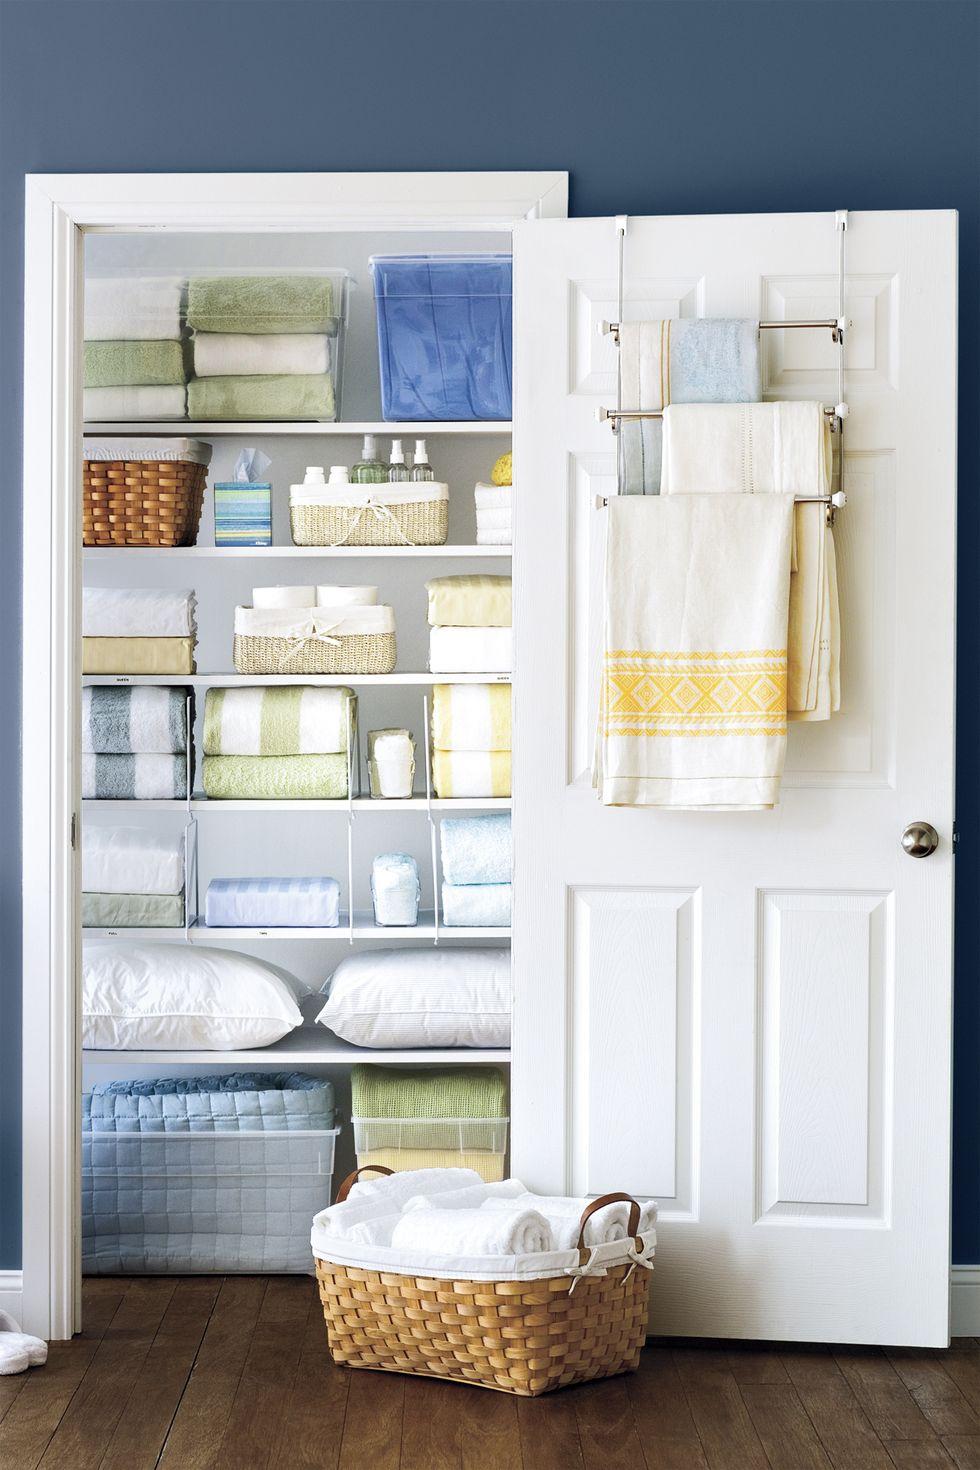 towel-bars-linen-closet-organization-1544044941